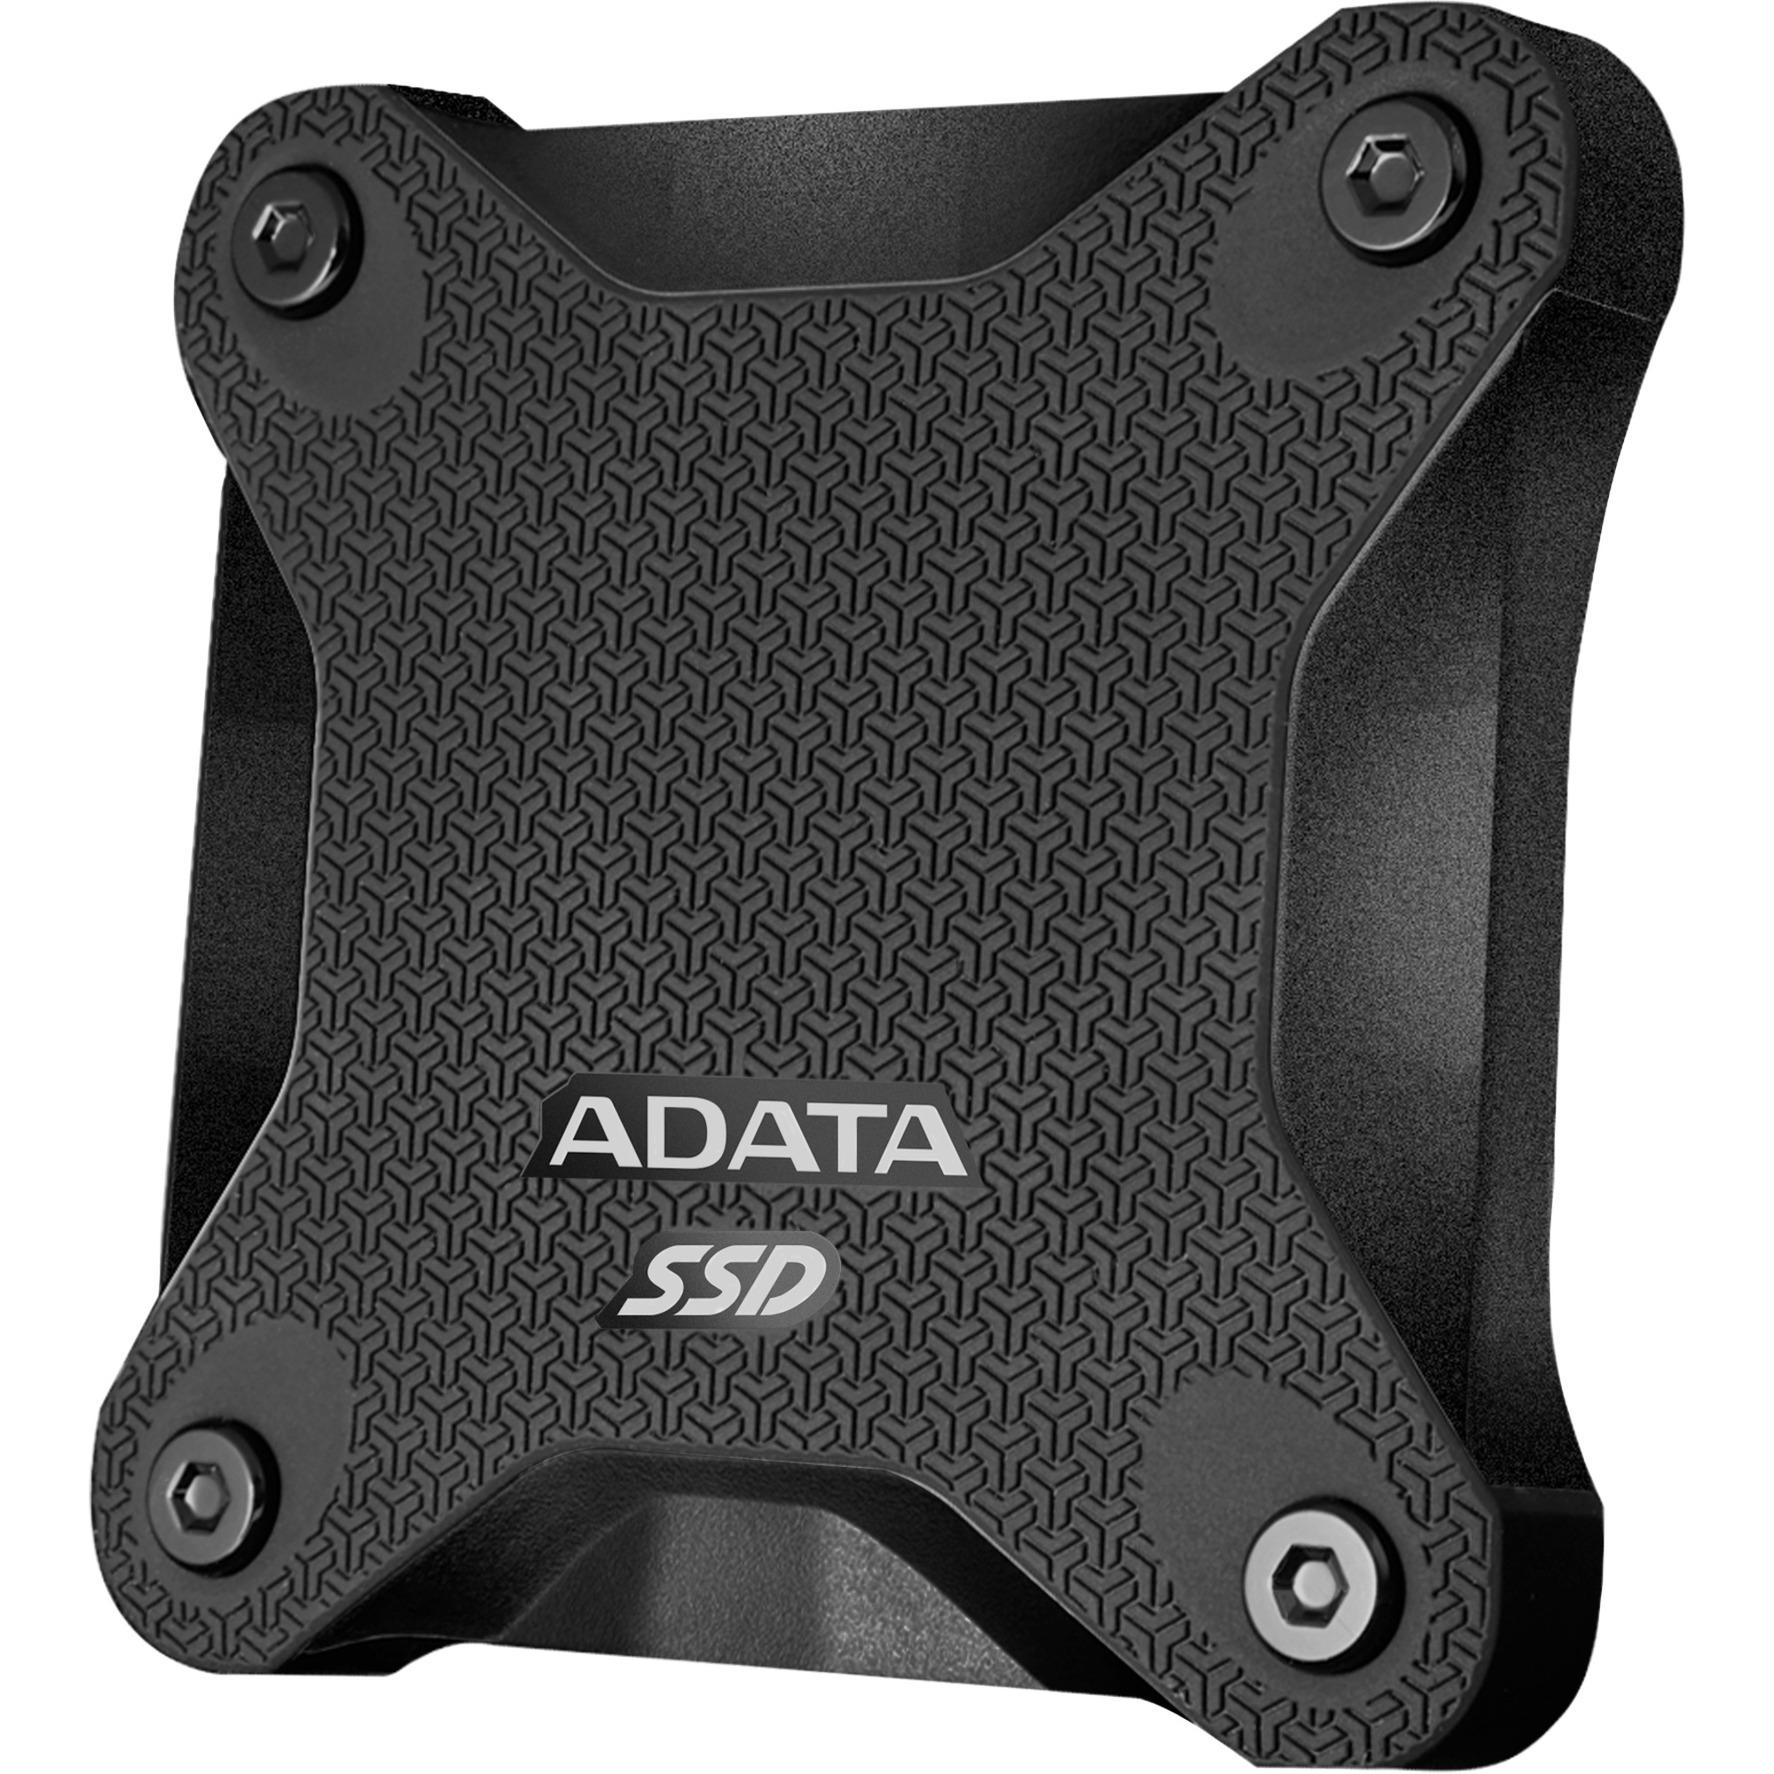 SD600 256GB 256Go Noir, SSD